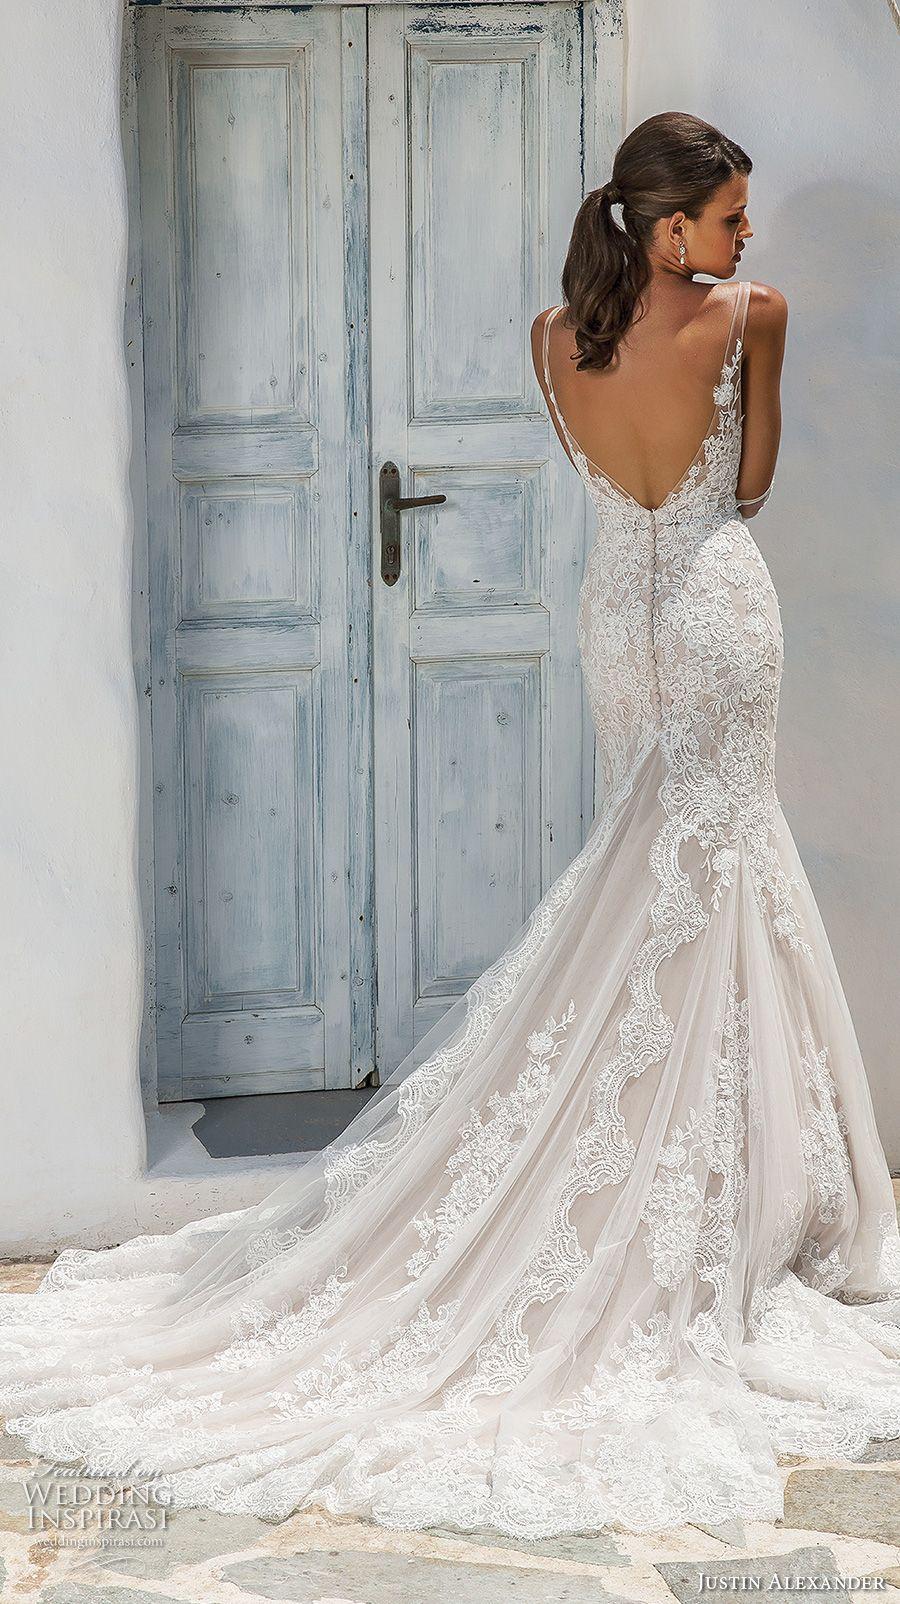 Lace wedding dress ivory january 2019 Justin Alexander  Wedding Dresses  Wedding Dresses  Pinterest